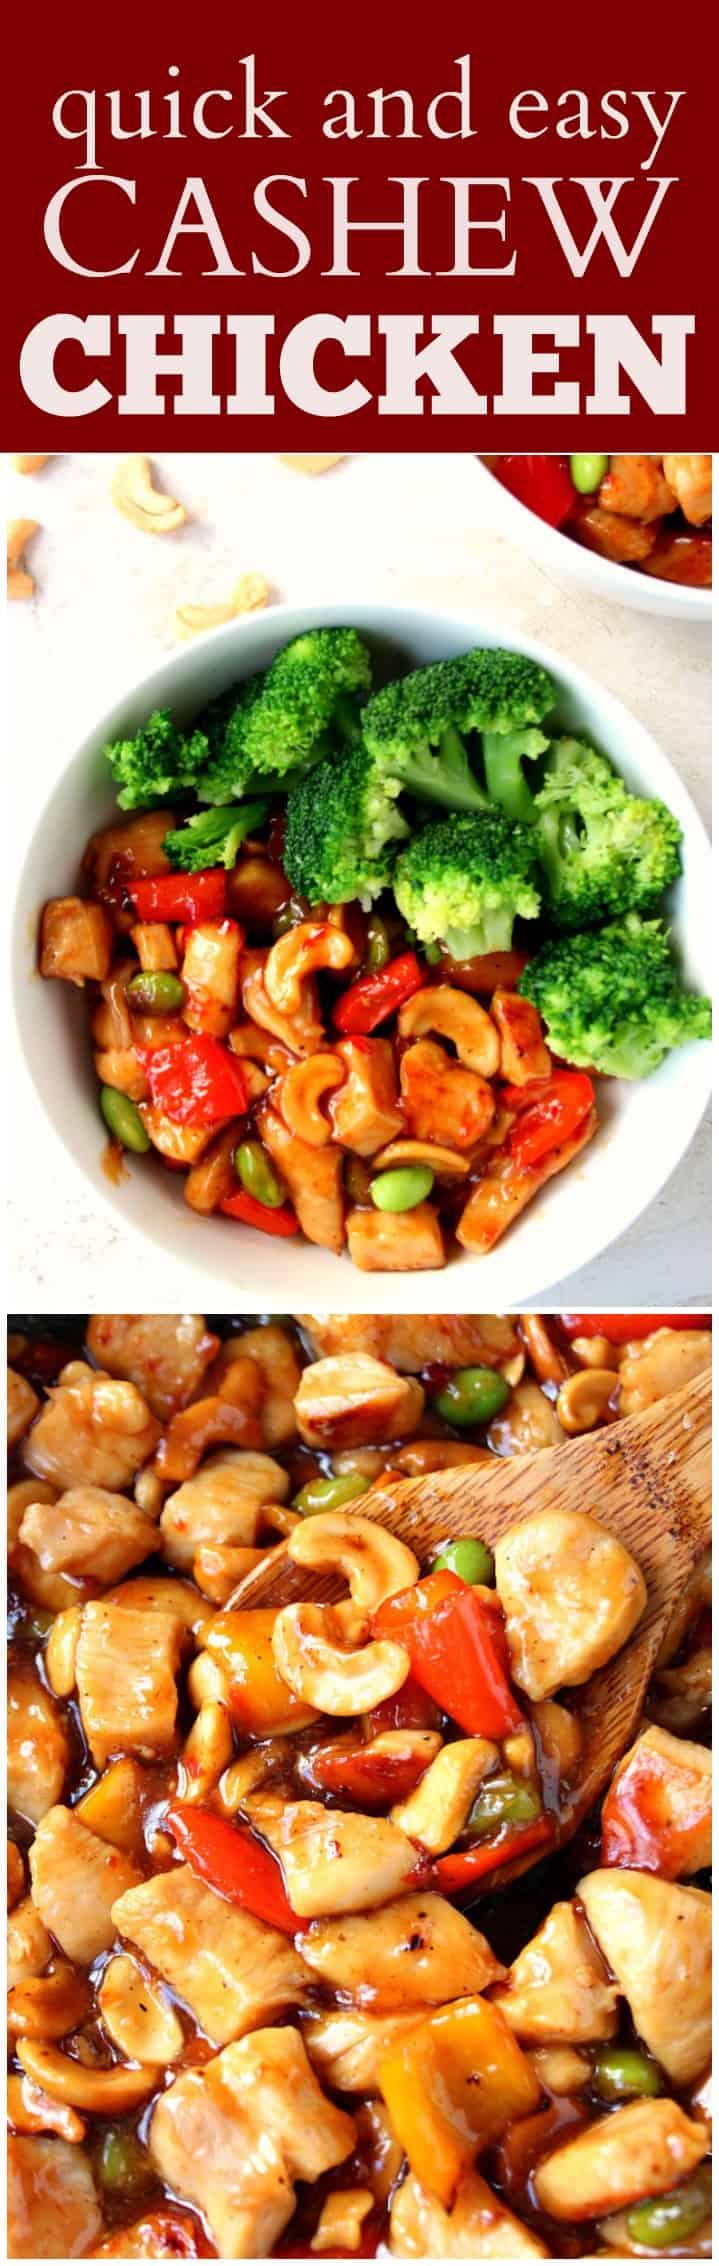 cashew chicken recipe long Quick and Easy Cashew Chicken Recipe